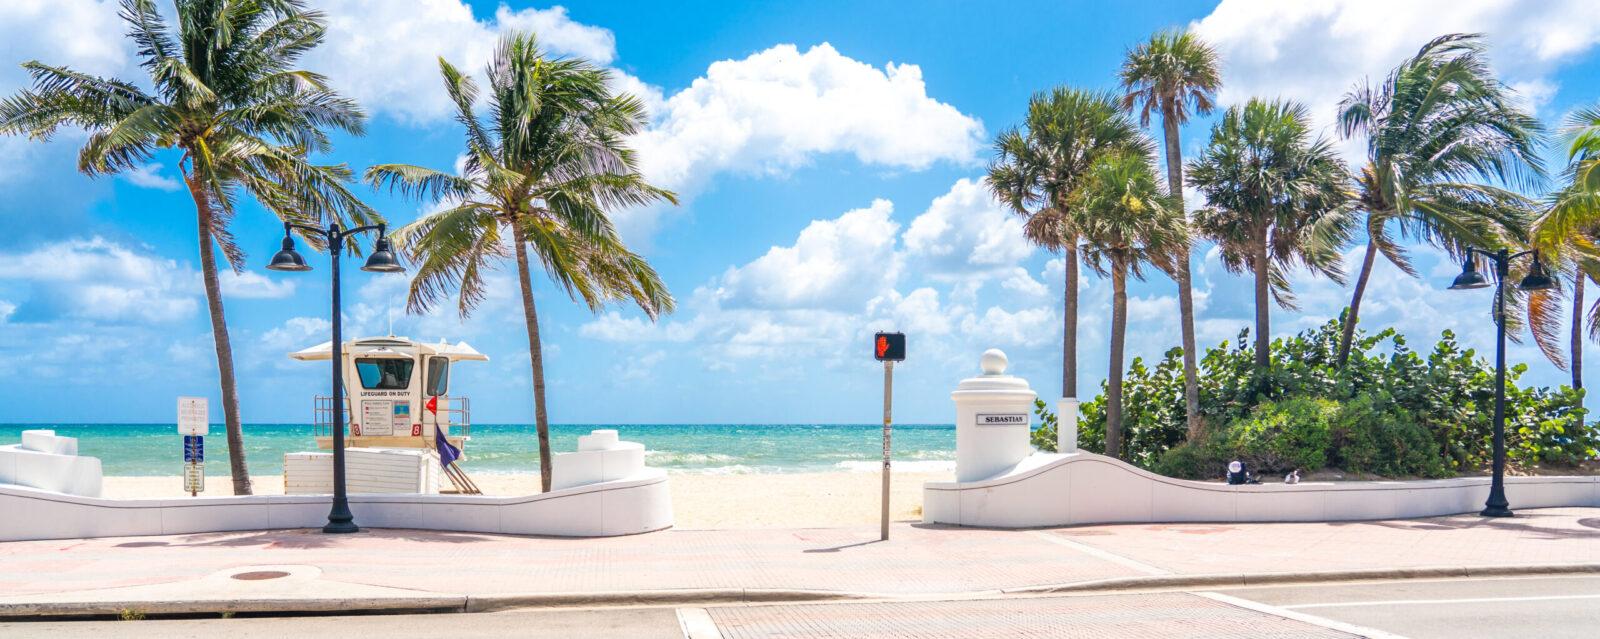 Florida Resorts Holidays: Why You Should Visit Orlando On